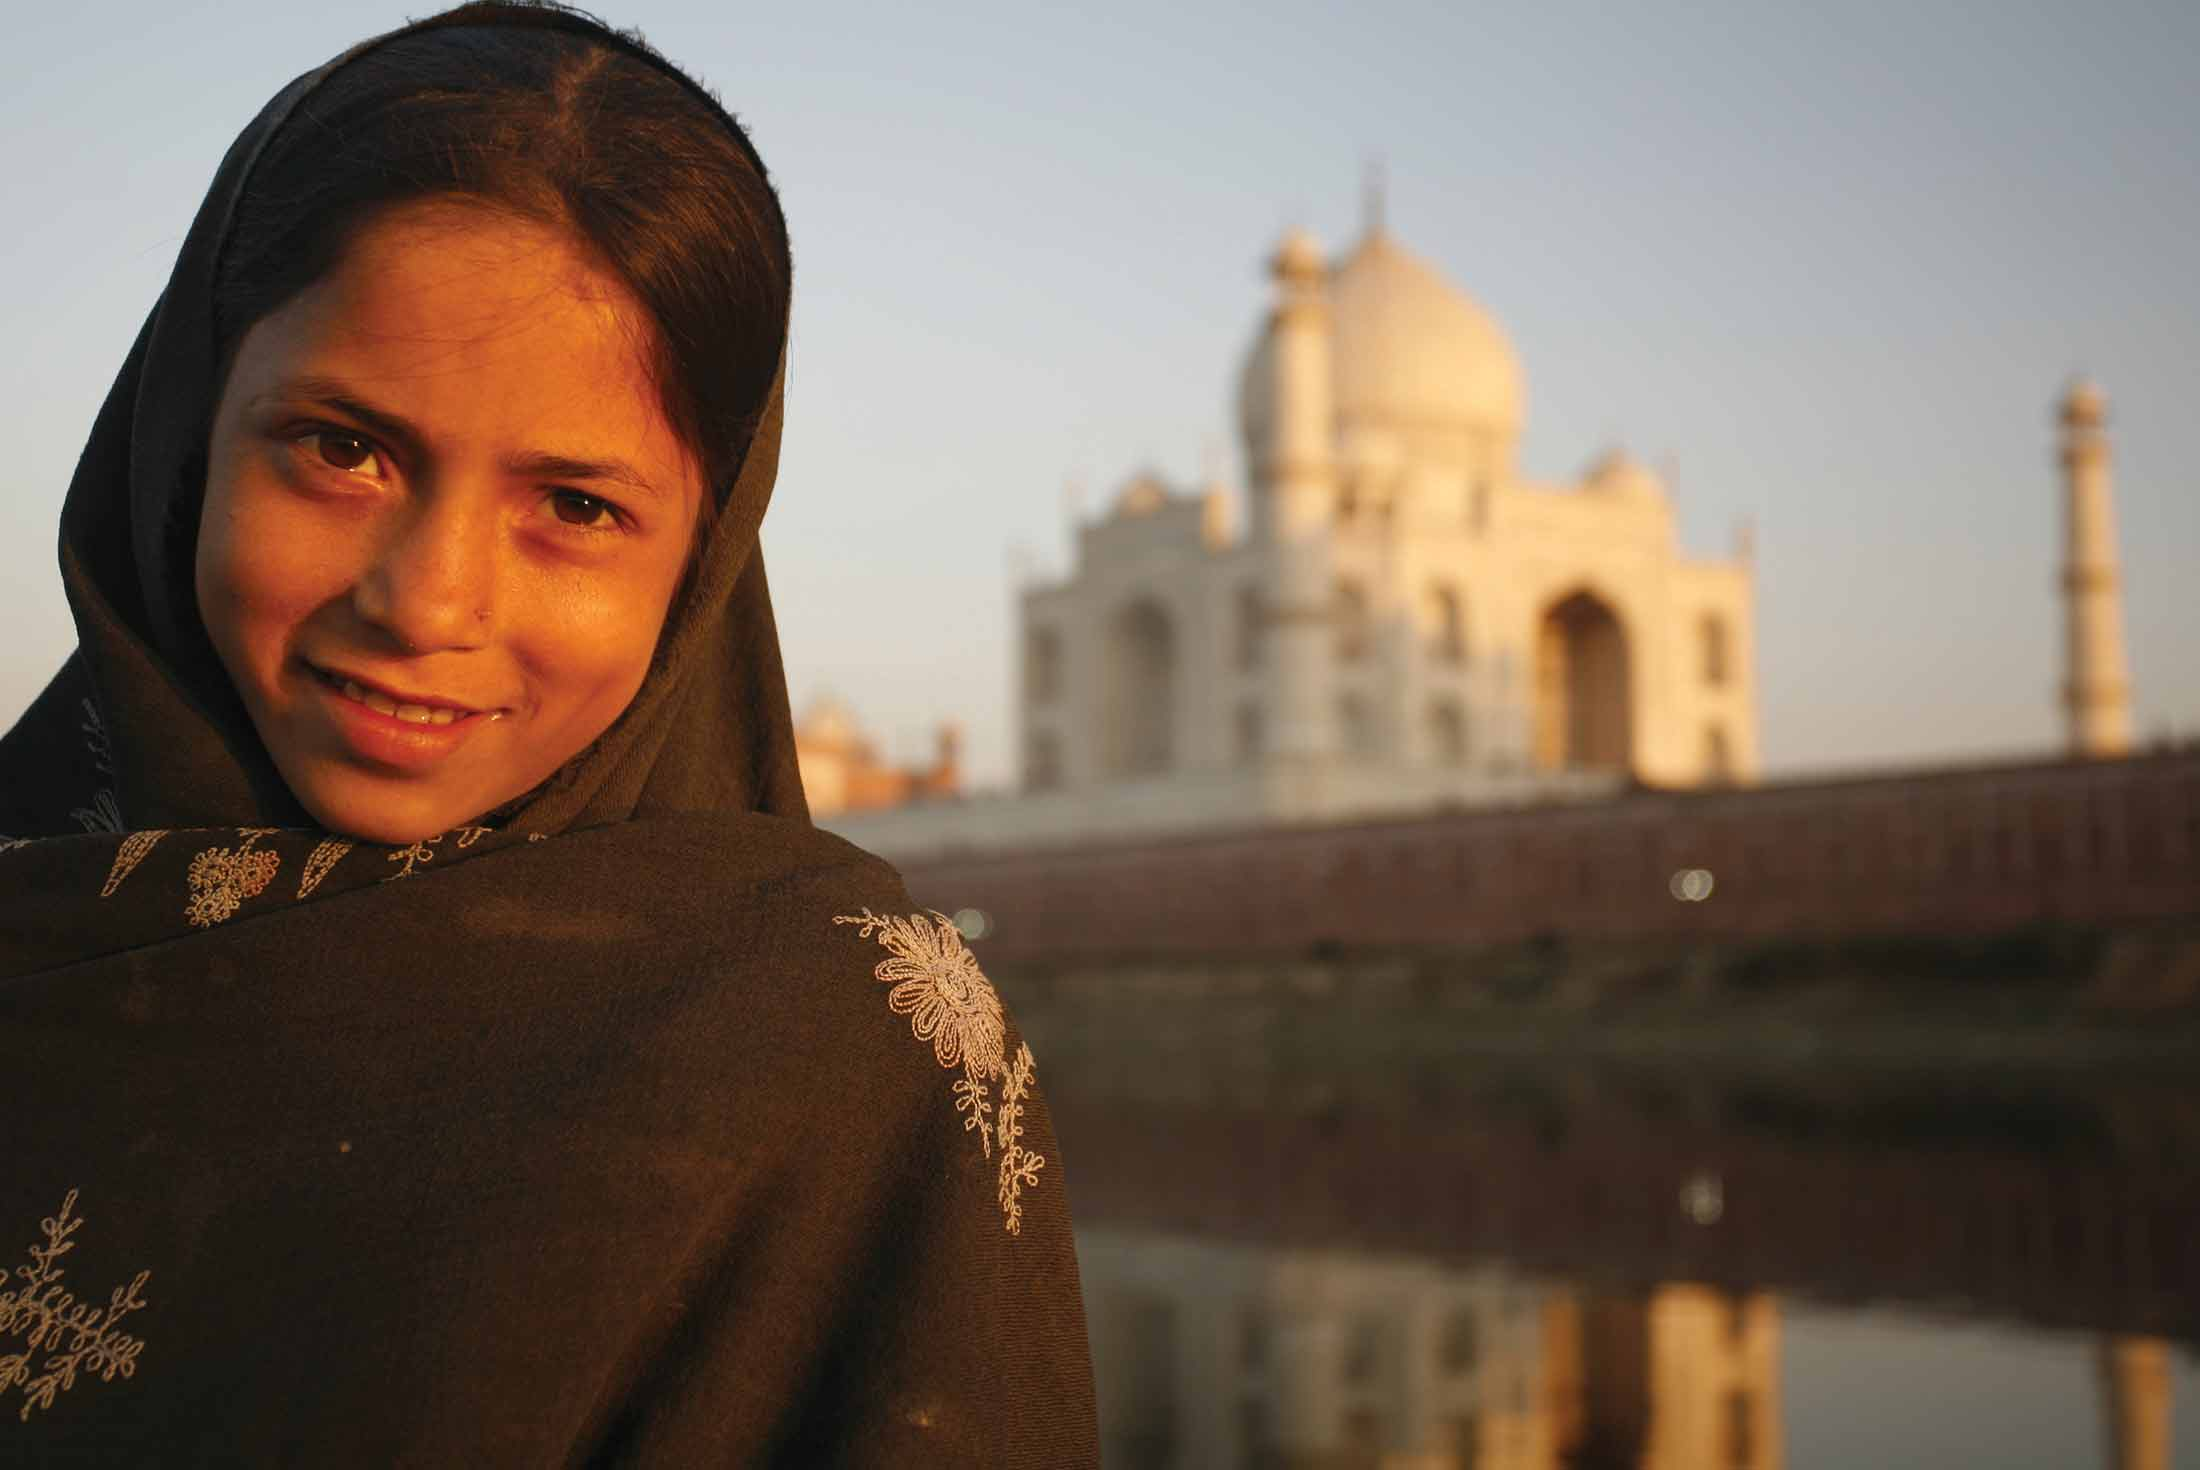 Taj & Agra Experience - Independent 1